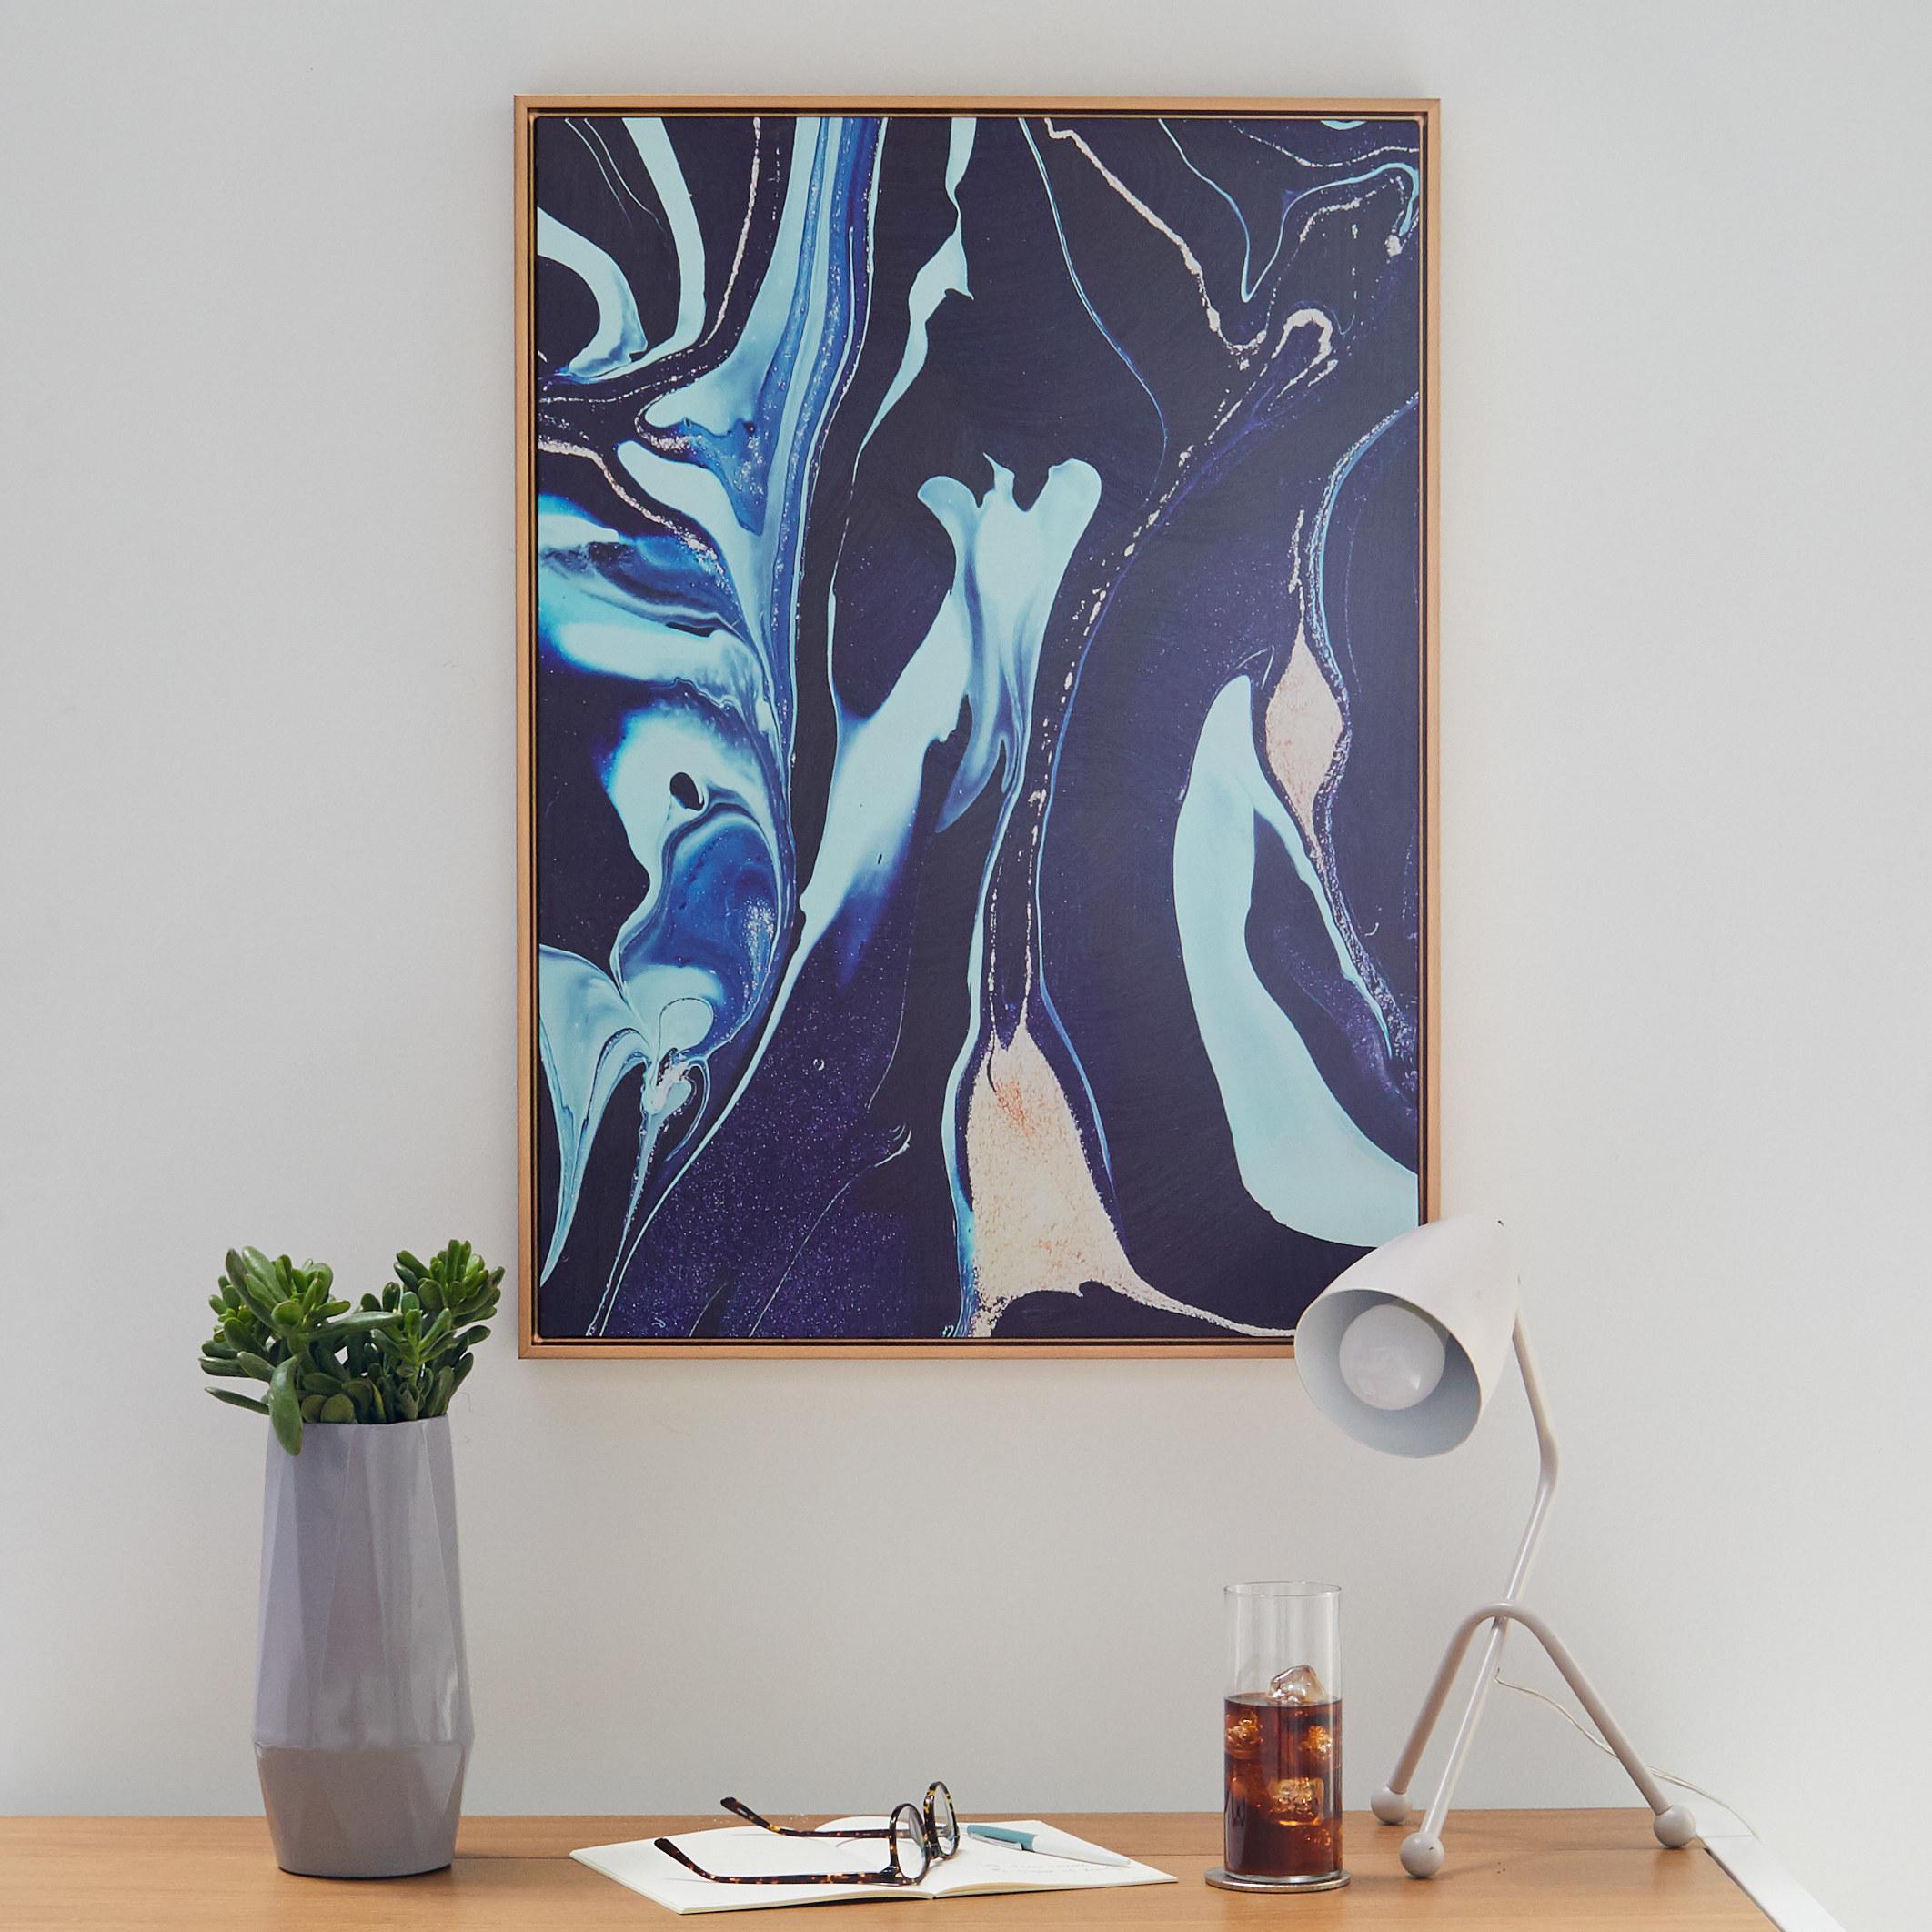 A framed print of a dark blue and light blue marble design